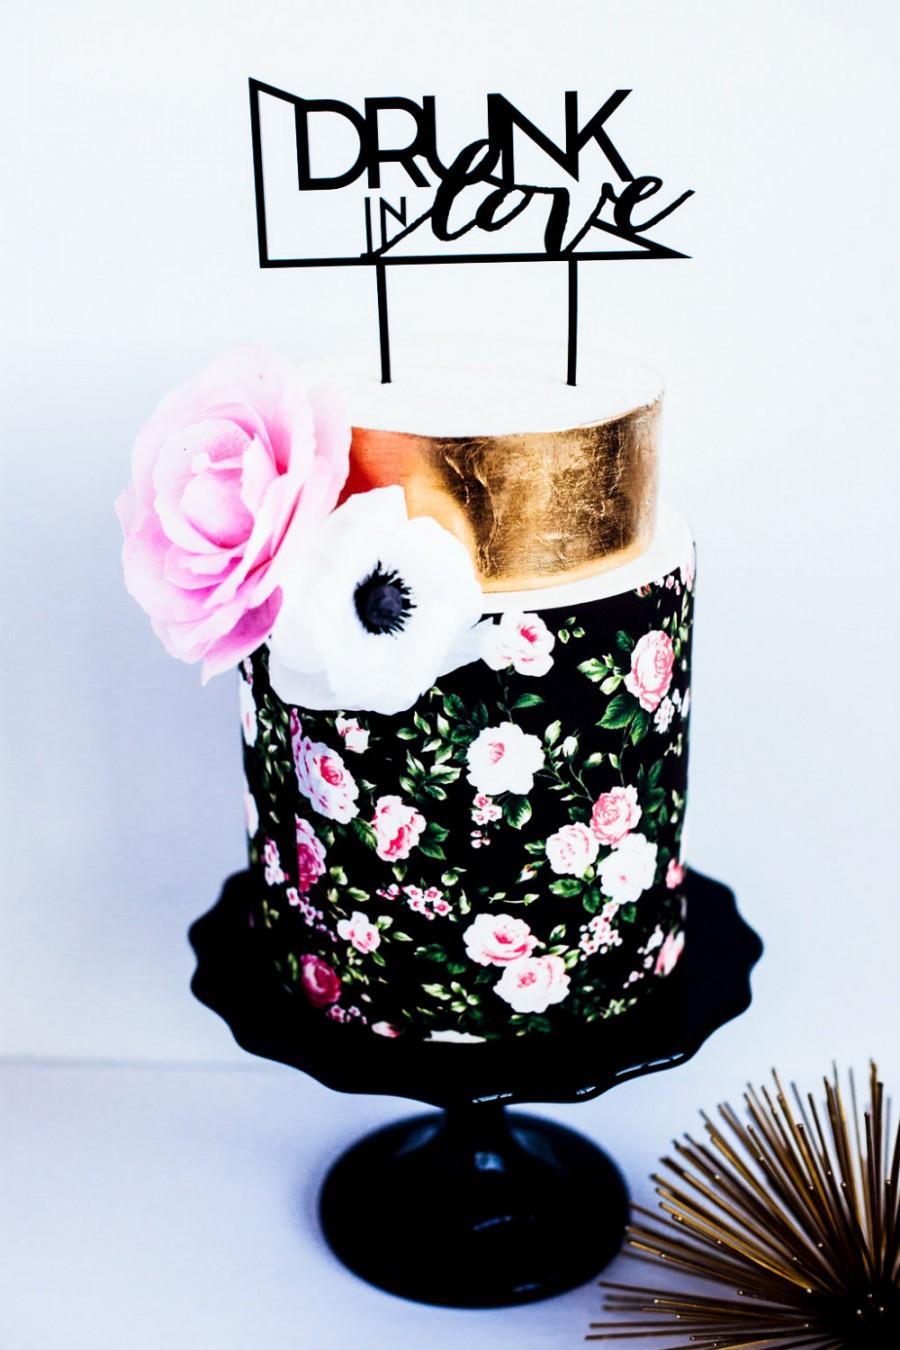 Drunk In Love Wedding Cake Topper, Laser Cut, Acrylic #2455736